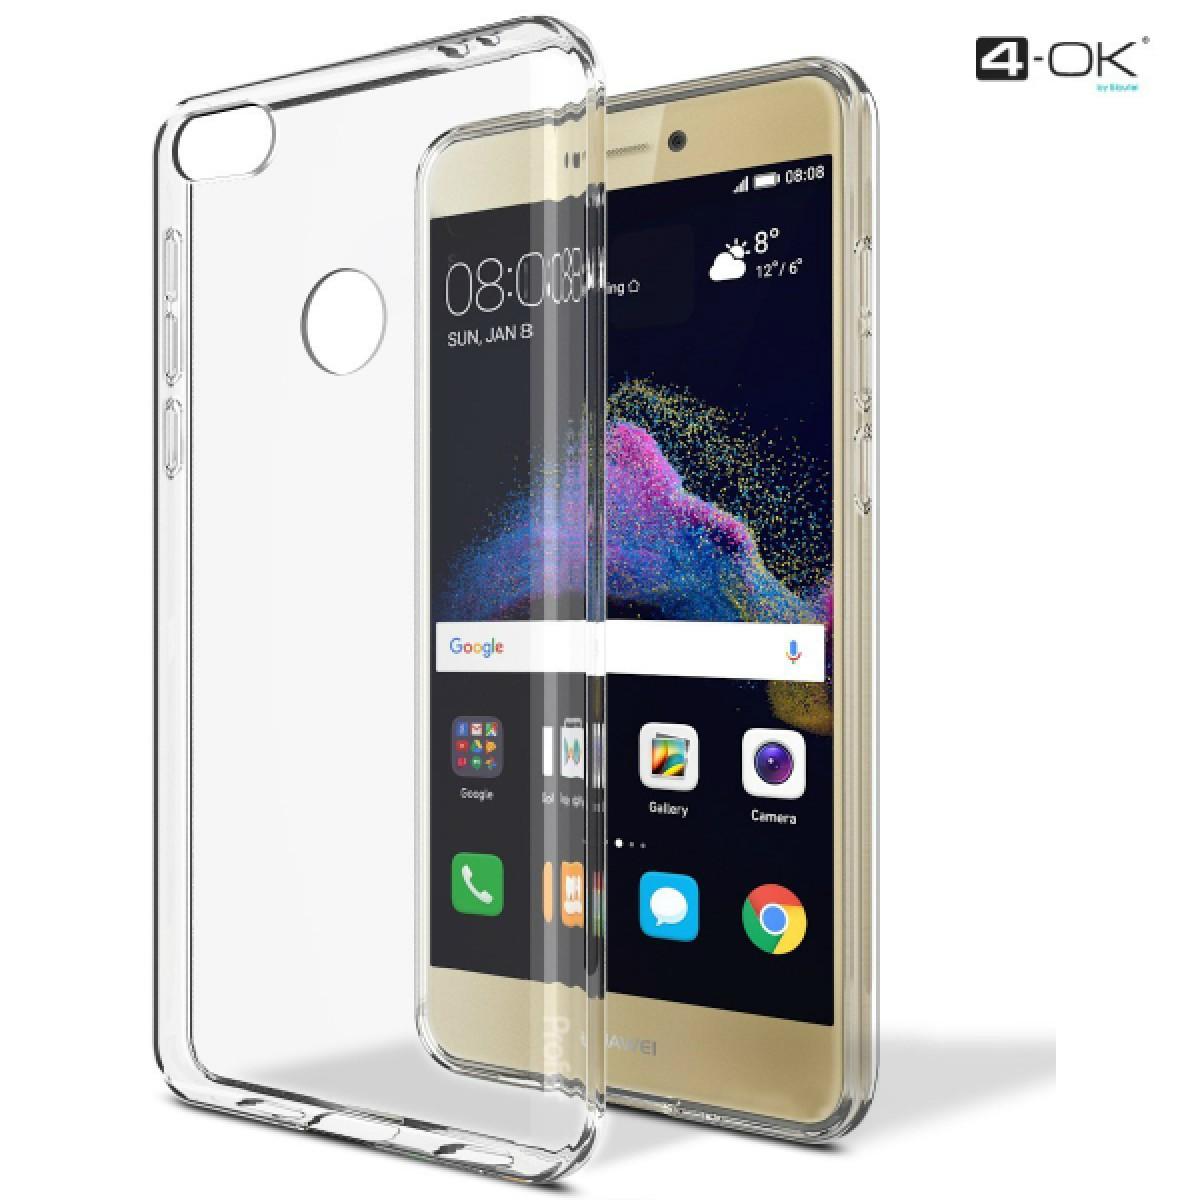 4-OK Protek 0.2 Ultra Slim Case - Huawei P8 Lite (2017) Transpar